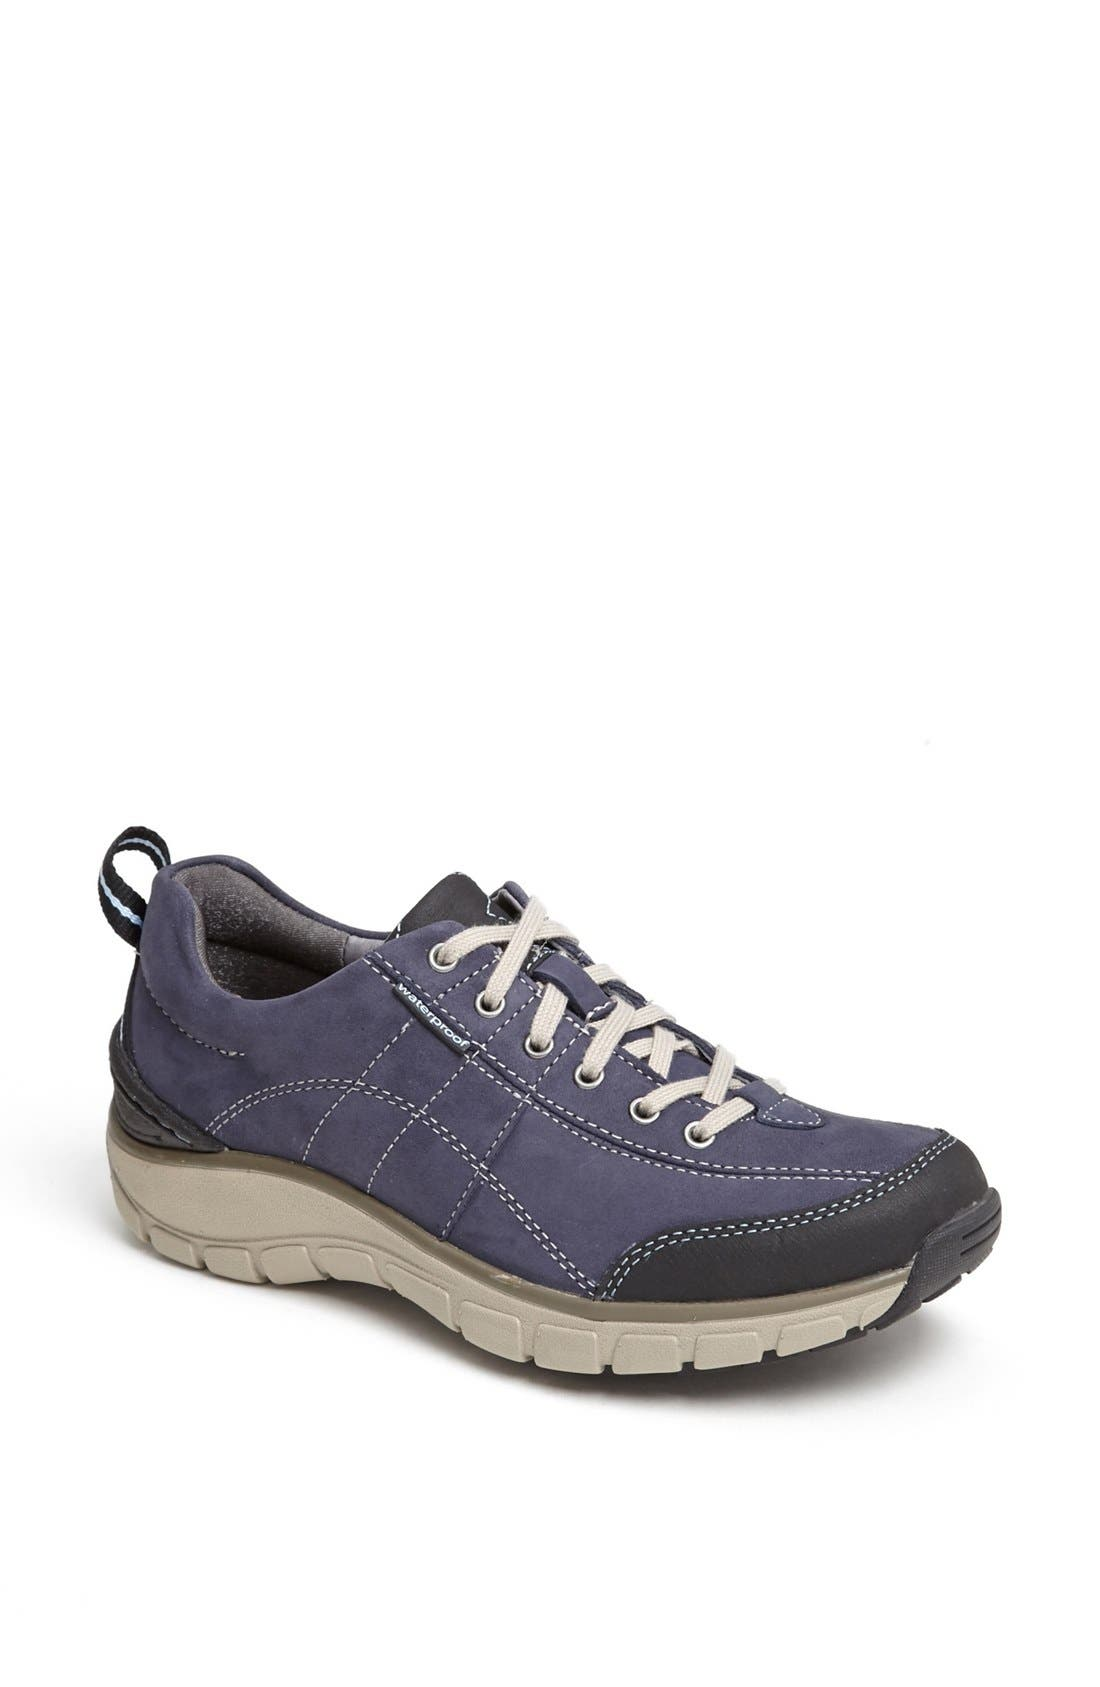 Main Image - Clarks® 'Wave Trek' Waterproof Sneaker